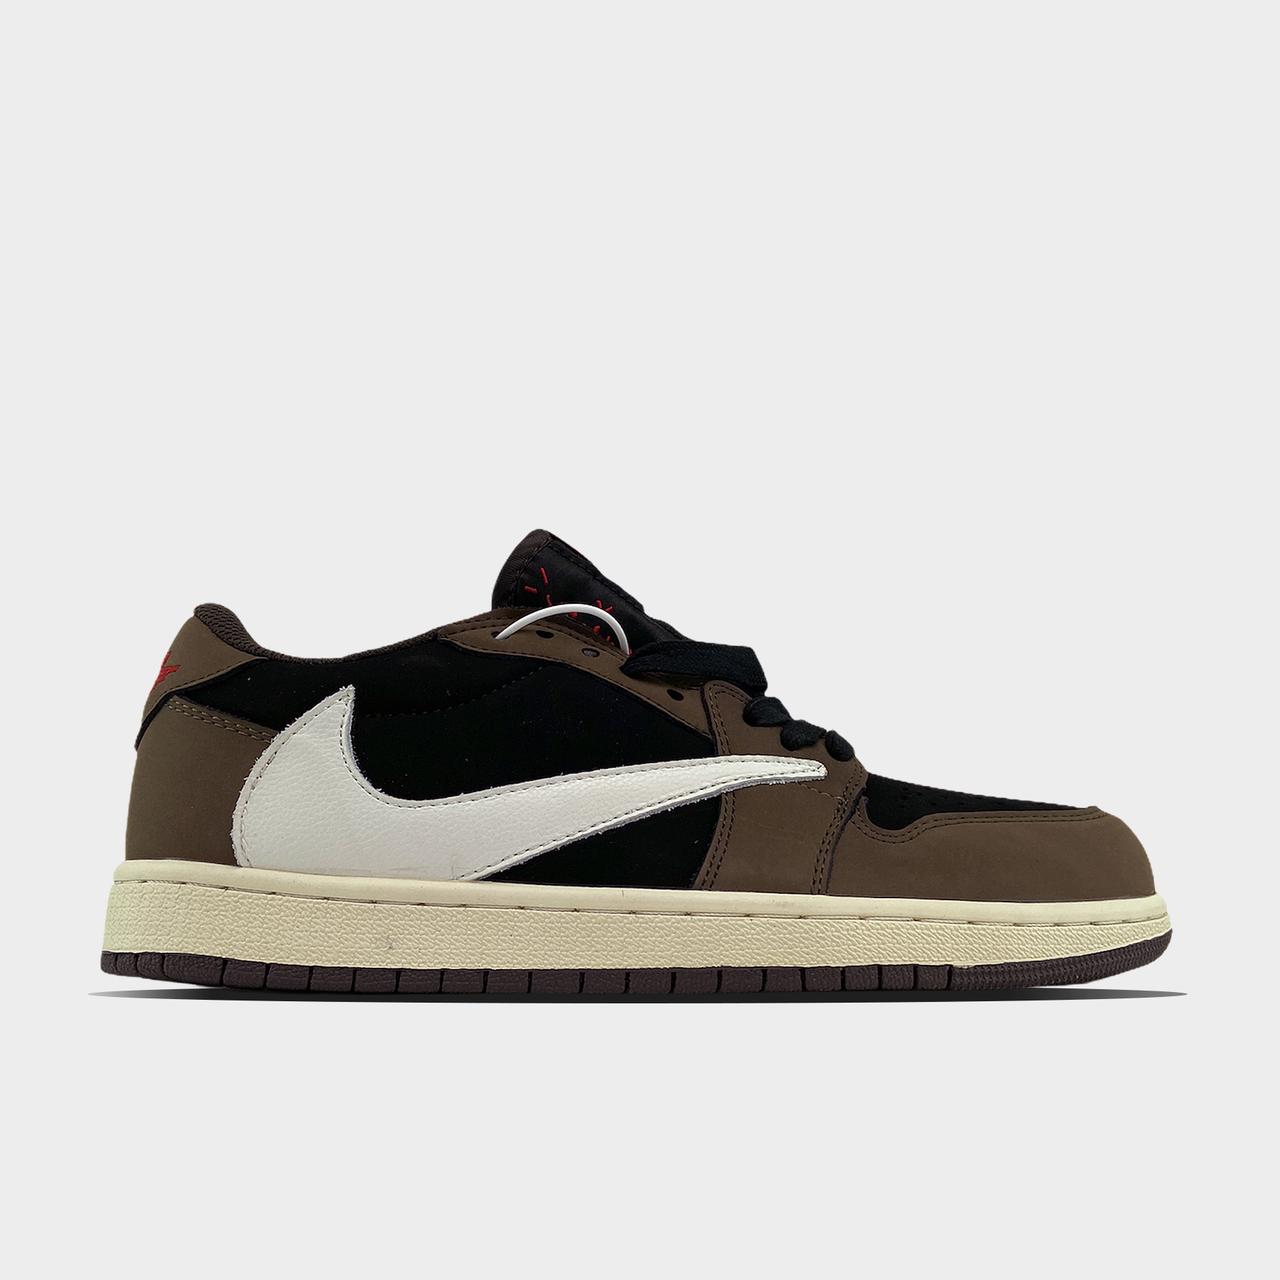 Nk, крос, обувь, взуття, sneakers, шузы, Air Jordan 1 Low Brown Travis Scott (Коричневый)